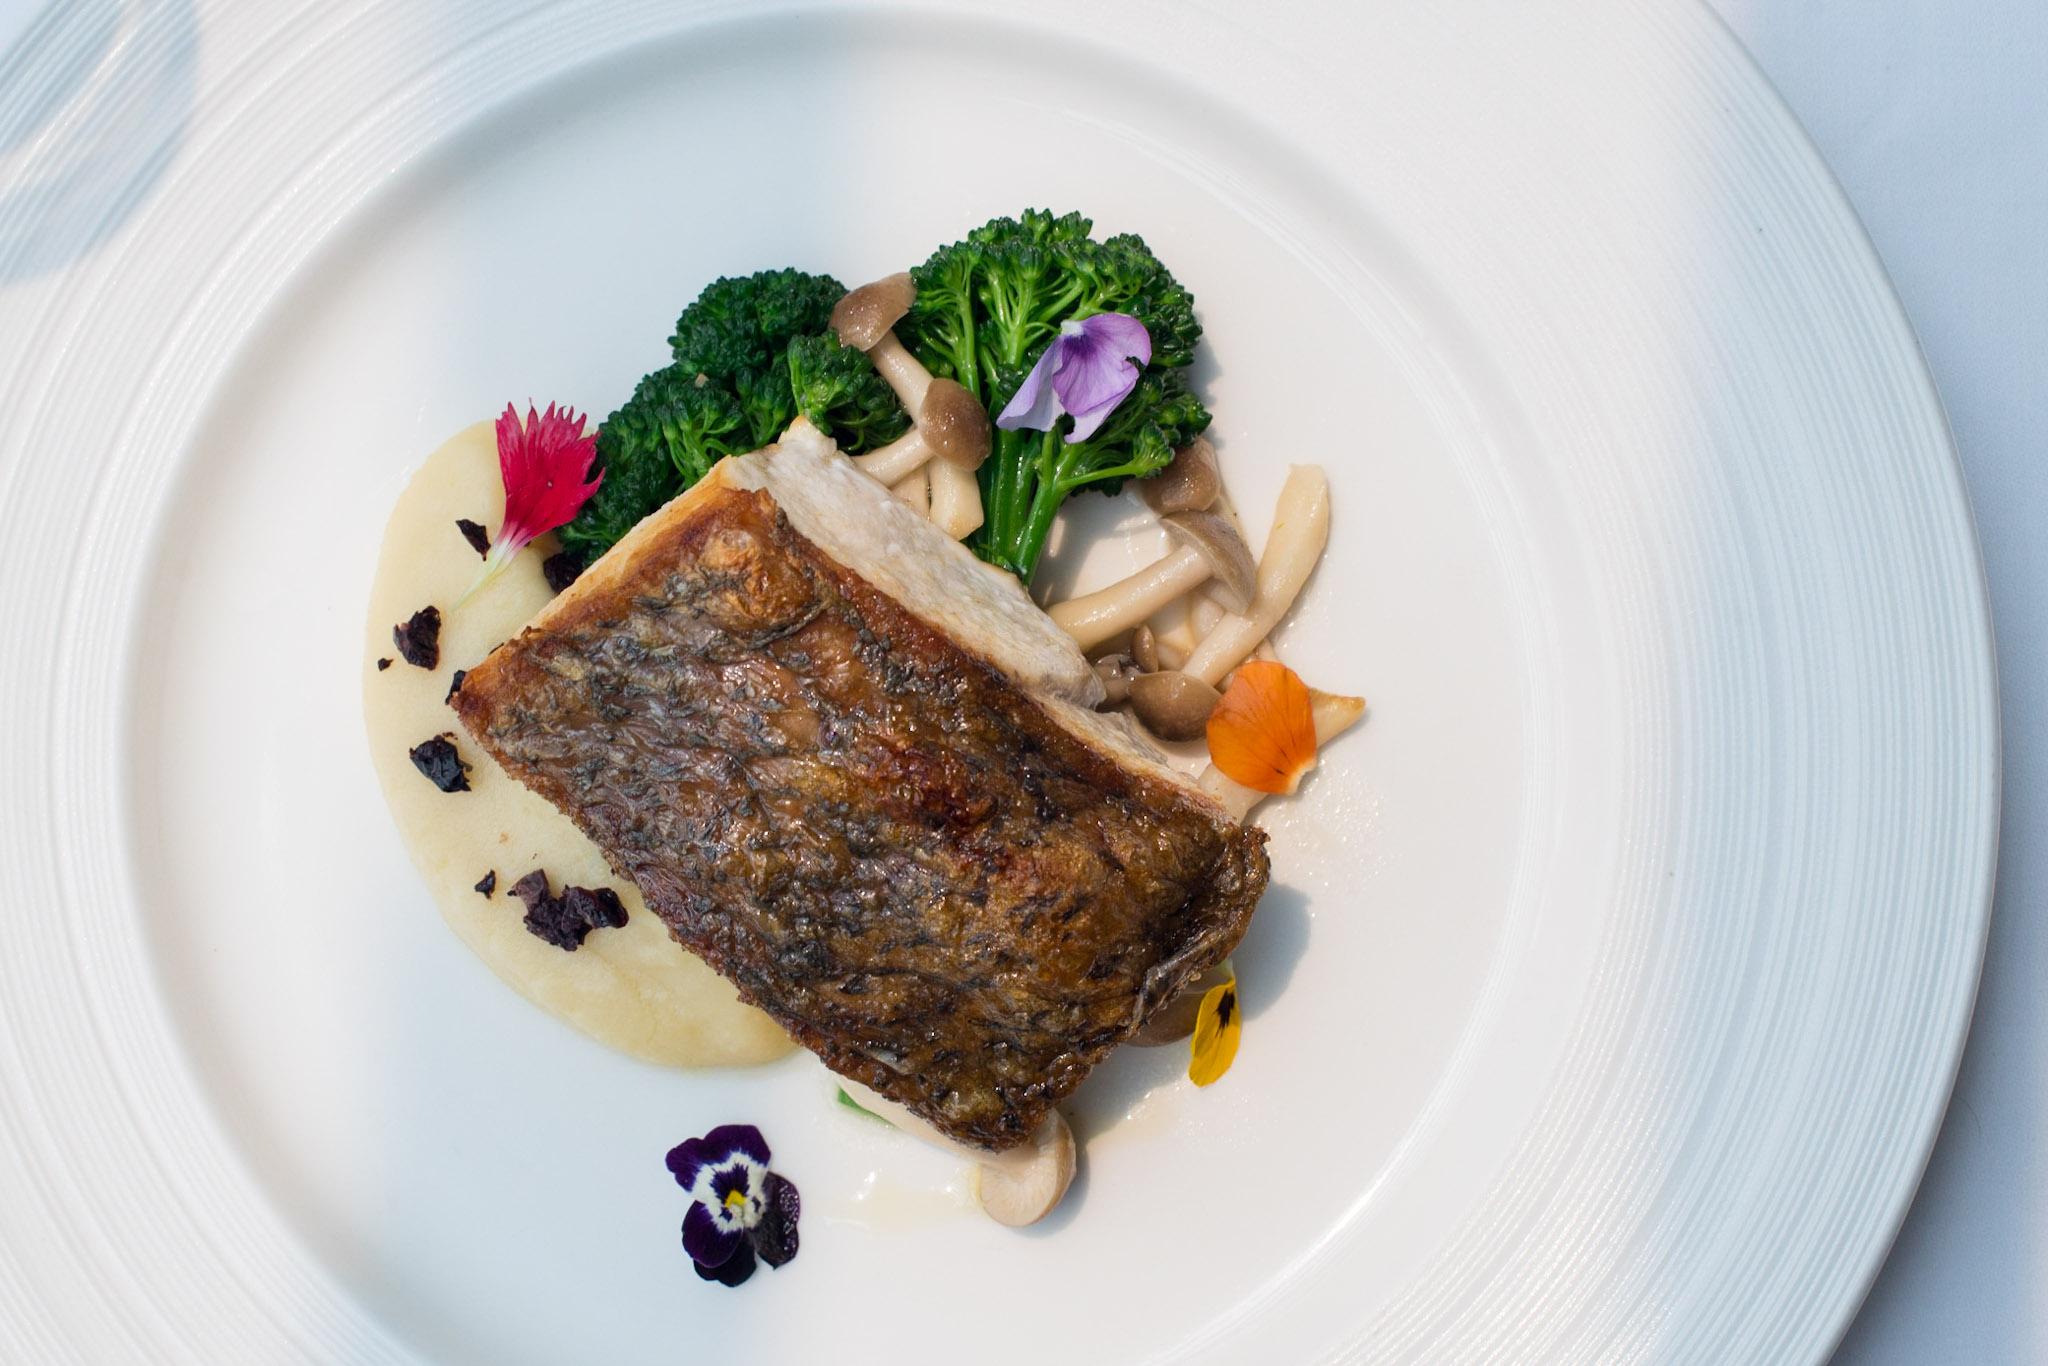 Pan-fried Seabass, Broccollini, Shimeji, Mash, Parsley, Black Olive  Pool Grill - Singapore Marriott Tang Plaza Hotel